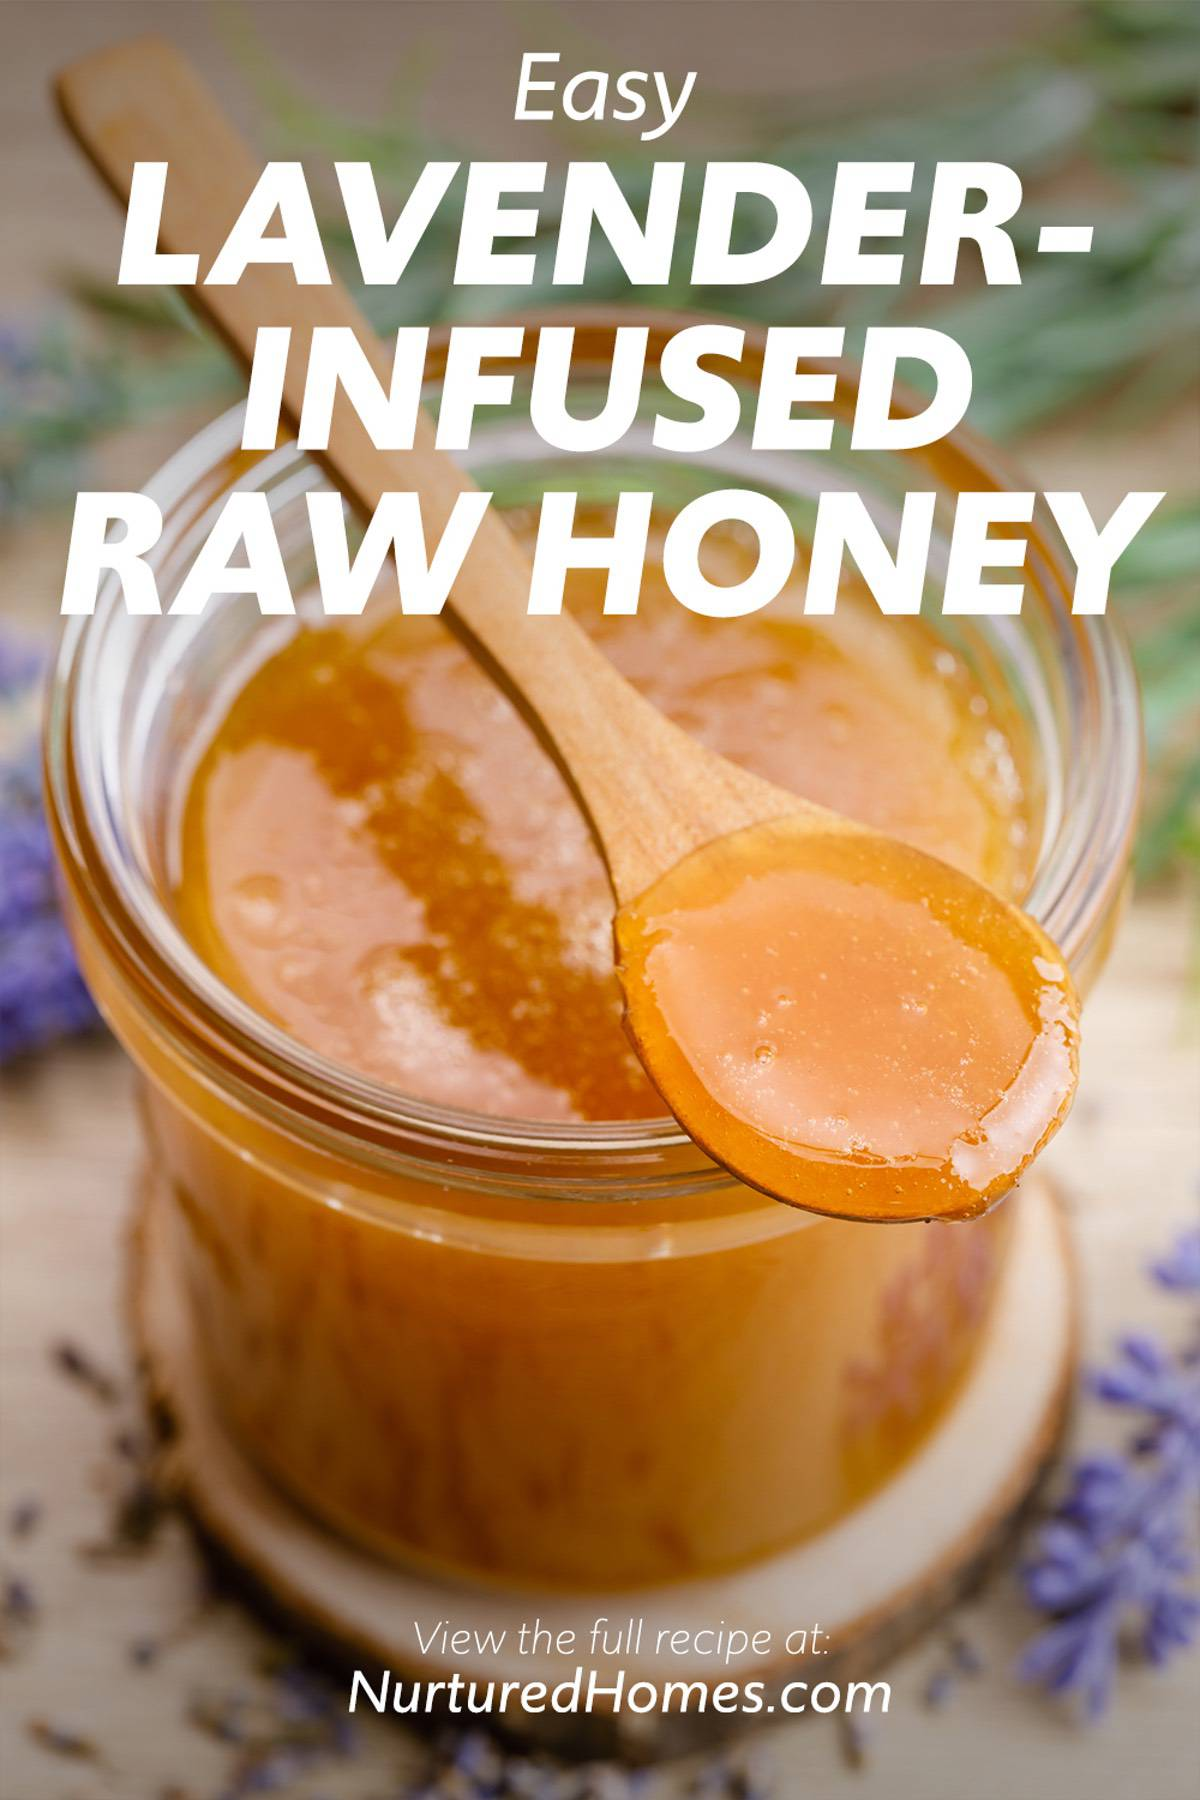 Easy Lavender-Infused Raw Honey Recipe